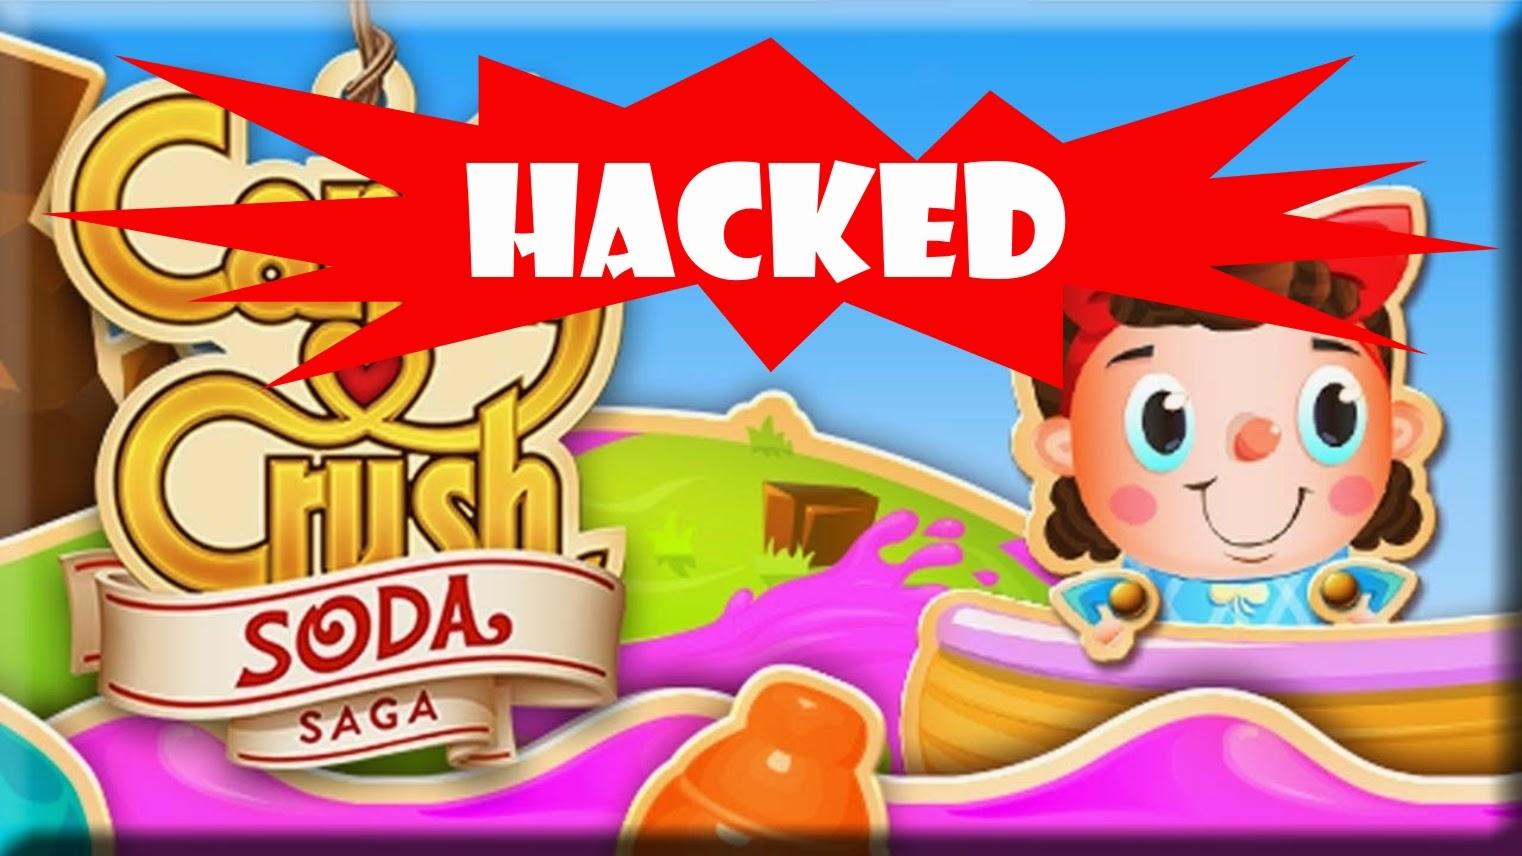 1522 x 856 jpeg 174kb candy crush soda saga hack tool free hacks